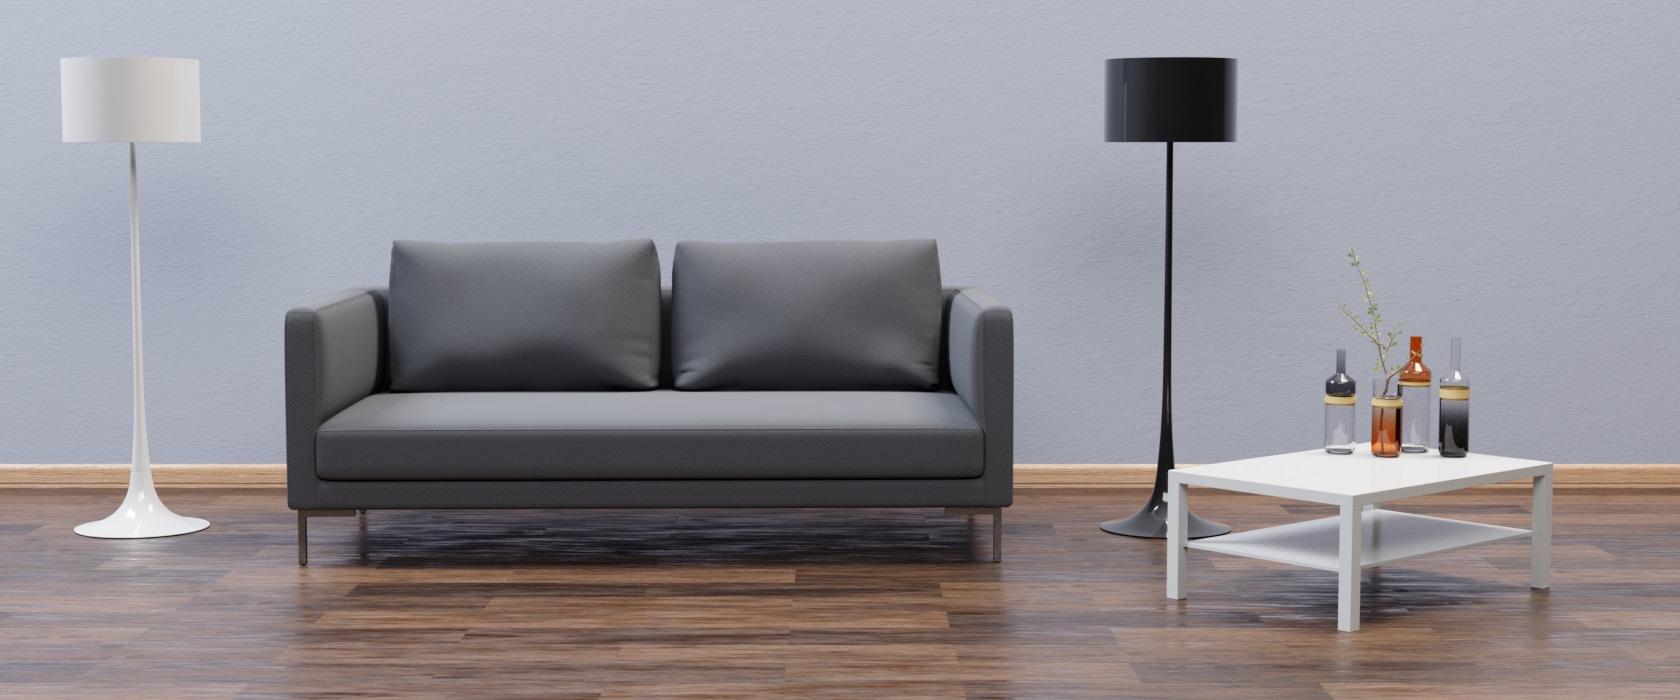 Двухместный диван Augusto - Фото 2 - Pufetto